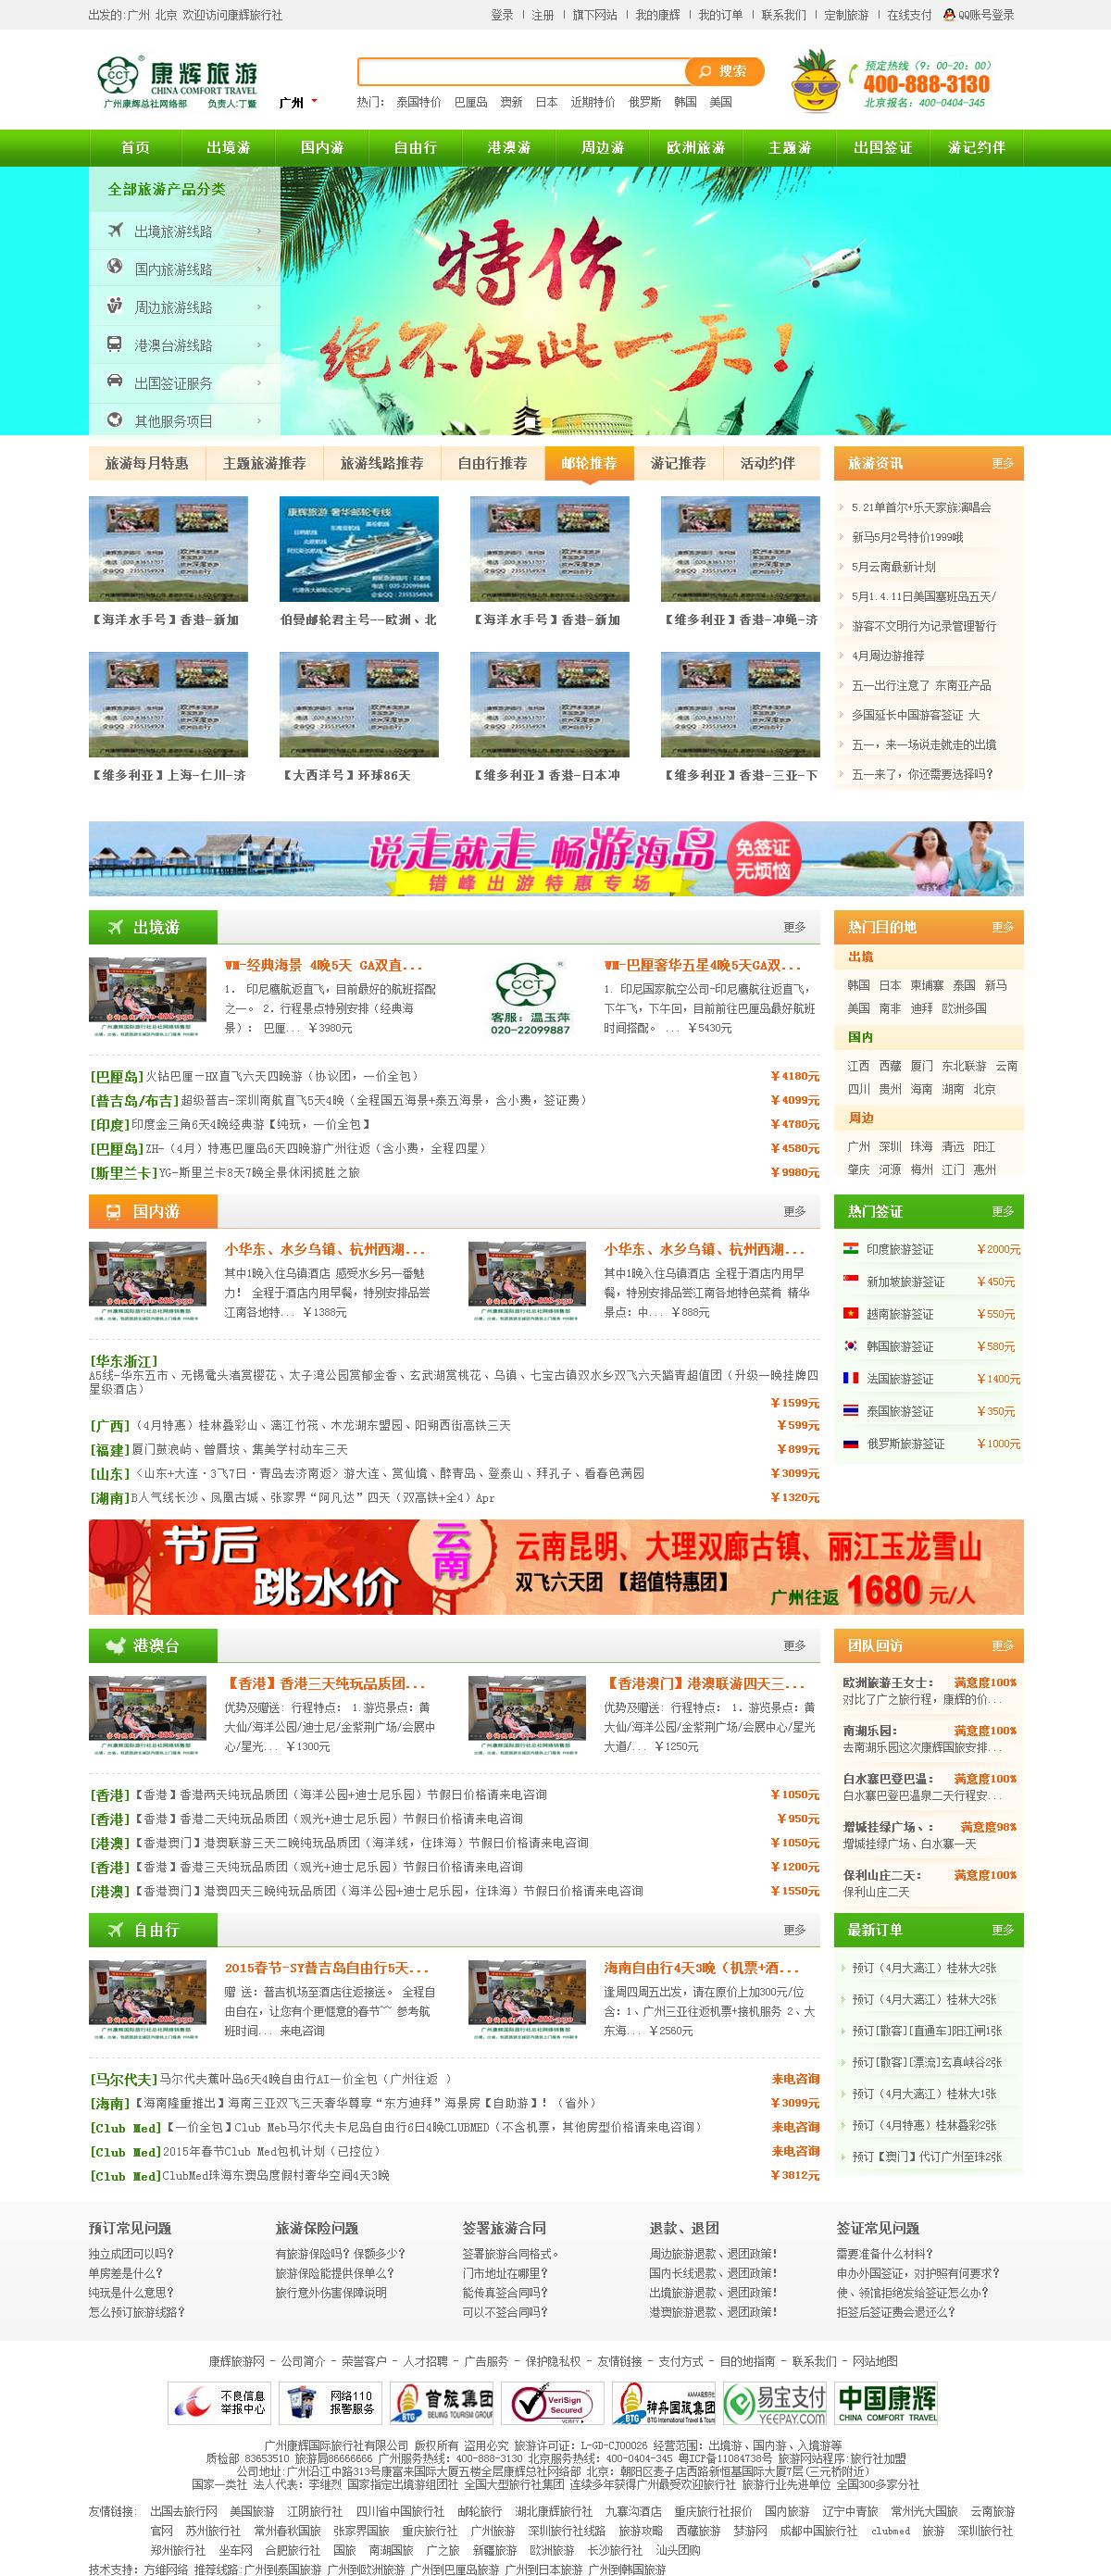 康辉旅游www.dafabet案例